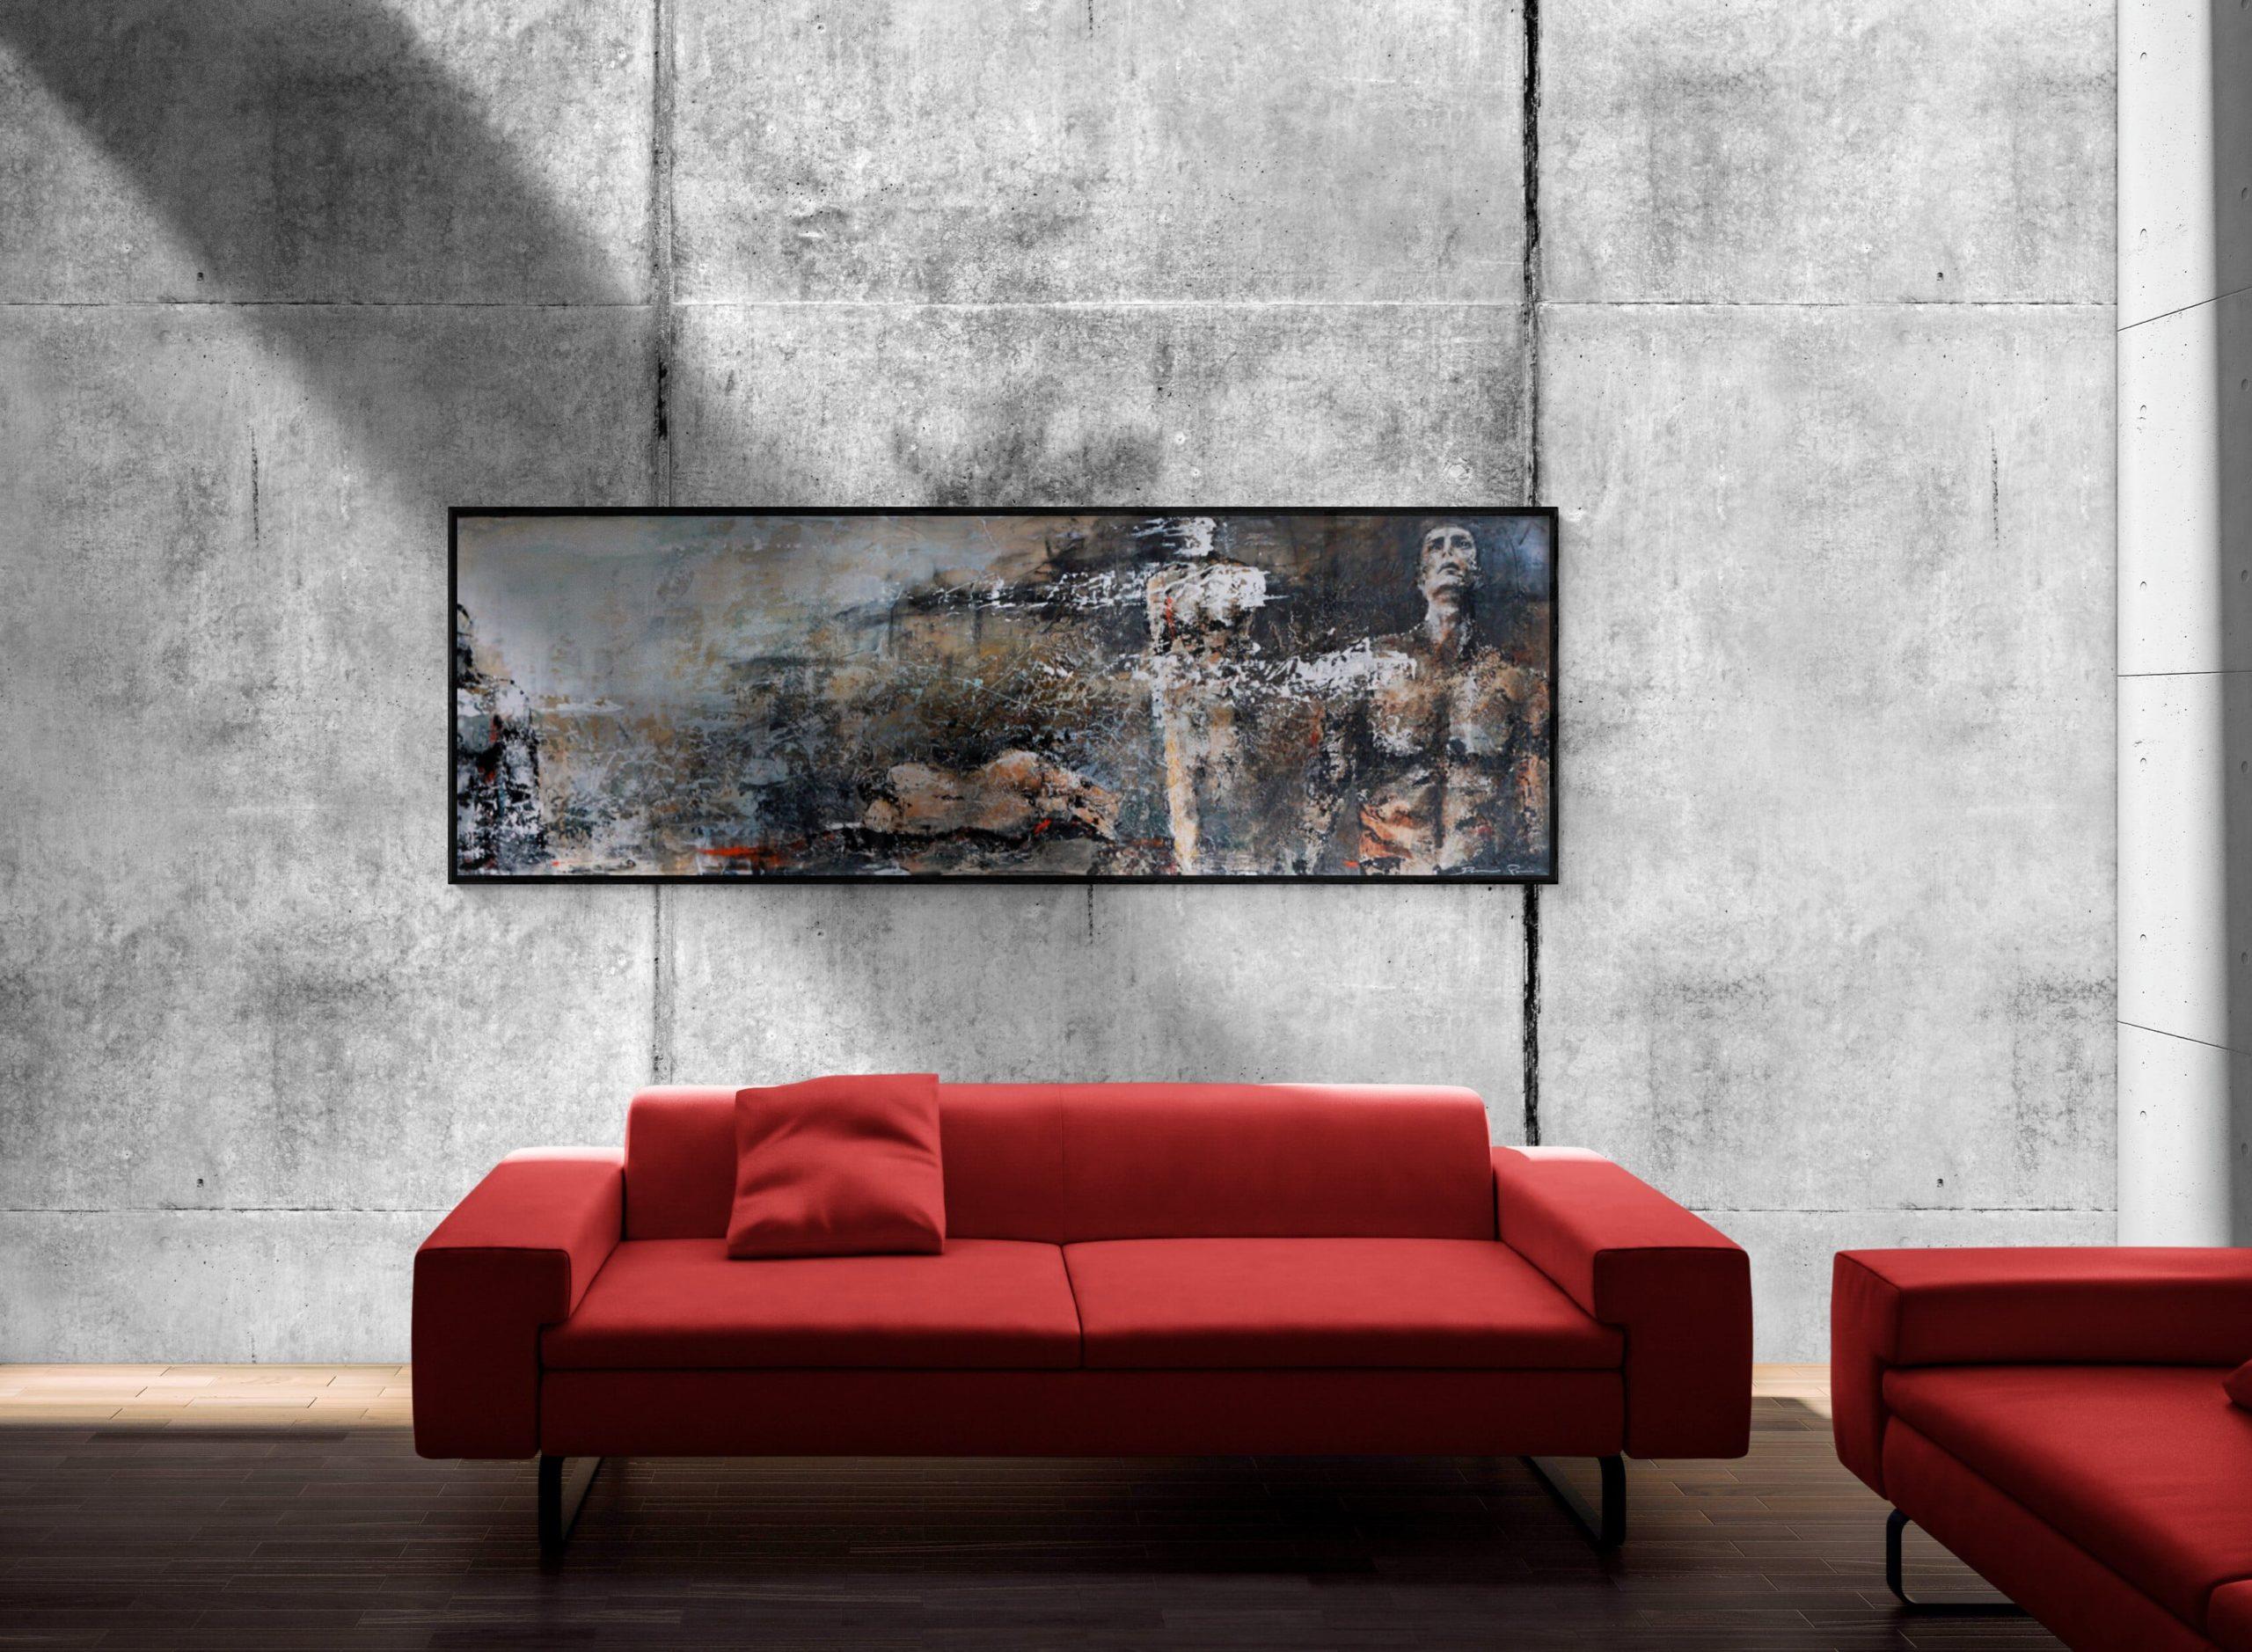 Brumes peinture acrylique Damien Rais 2